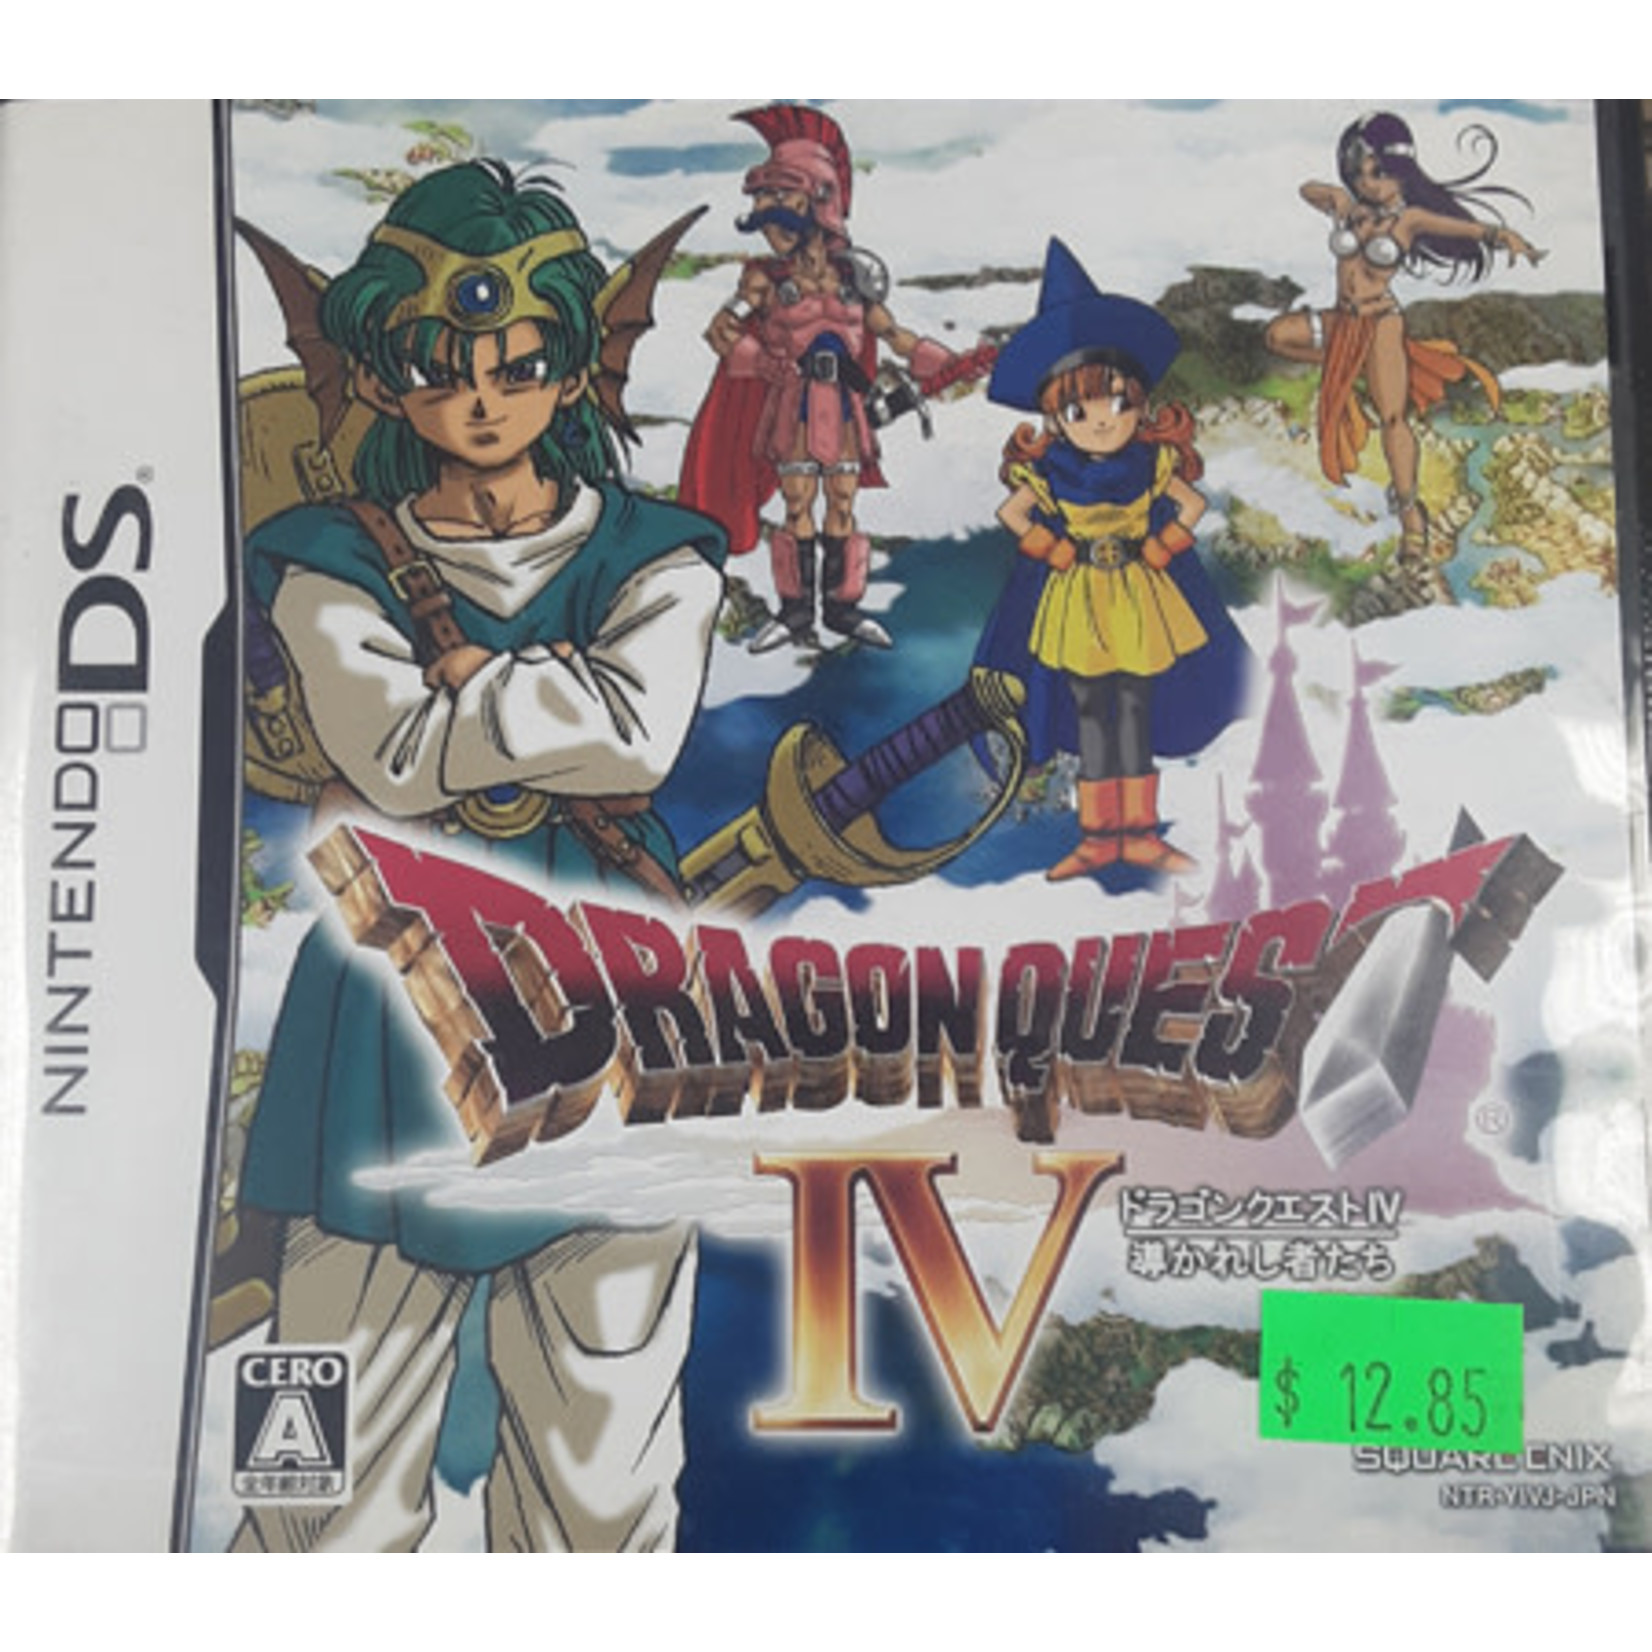 IMPORT-DSU-Dragon Quest IV